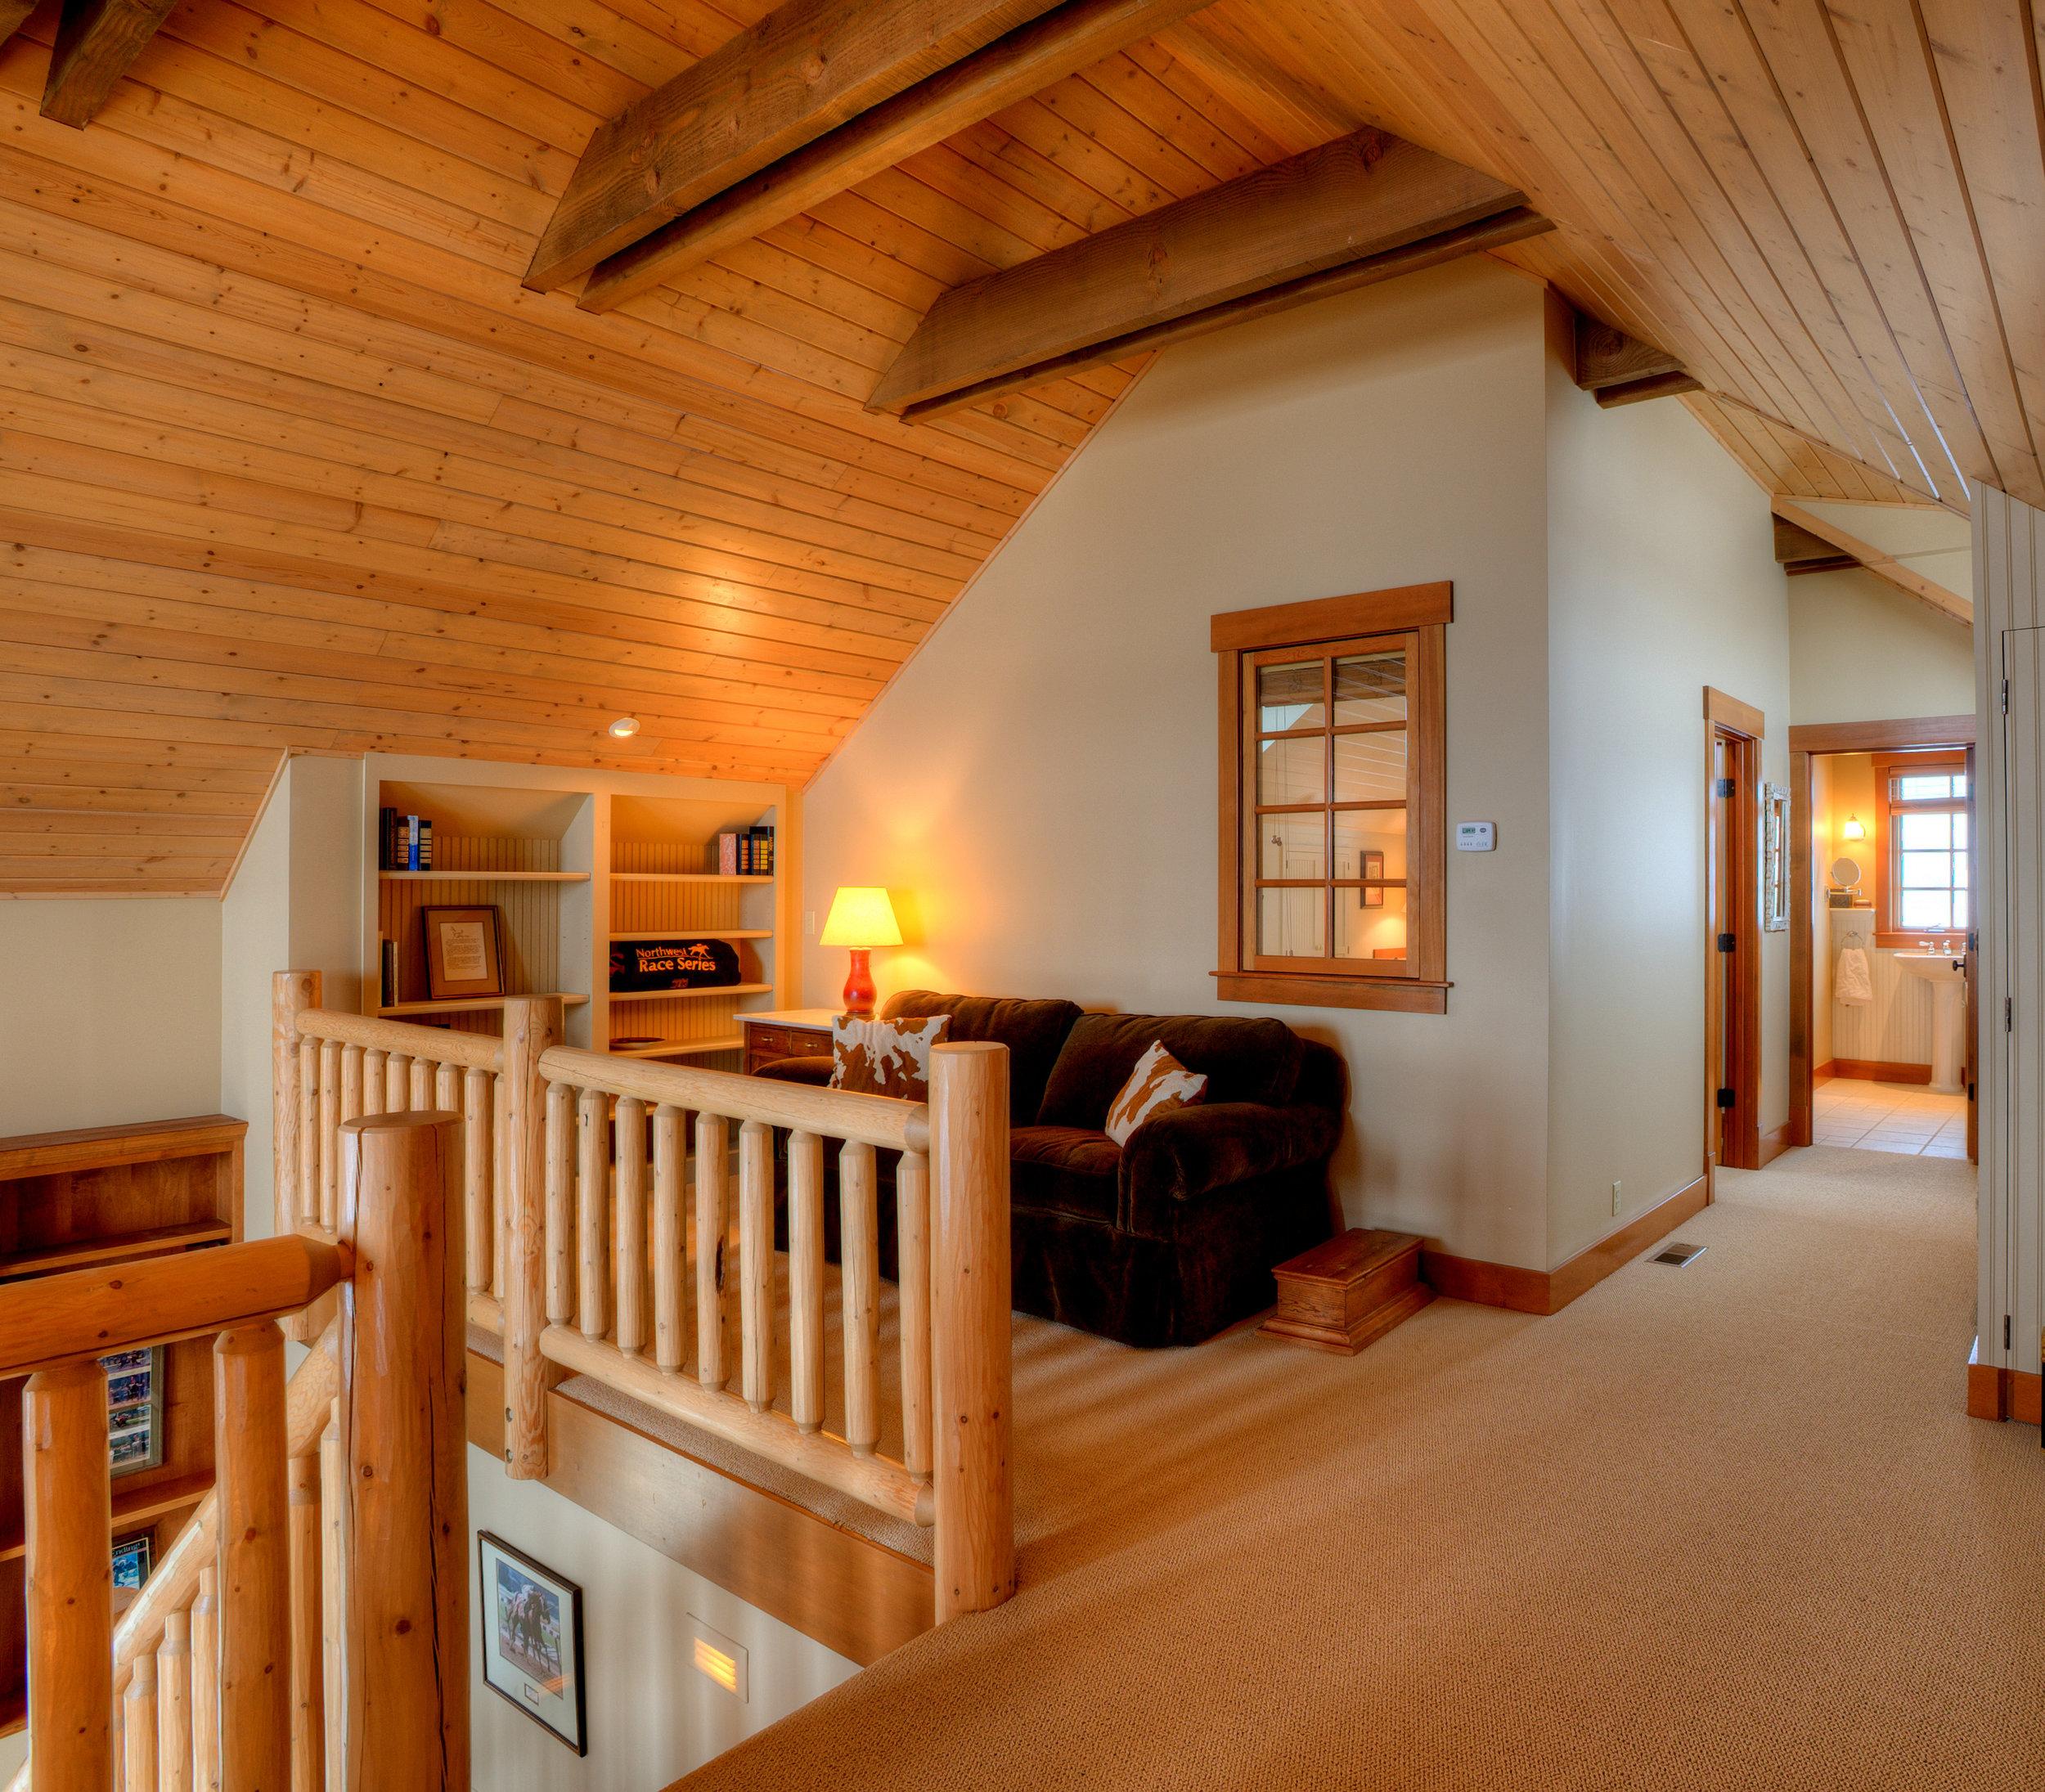 DNWA_Ellensburg_house-by-LHenning-large-038.jpg